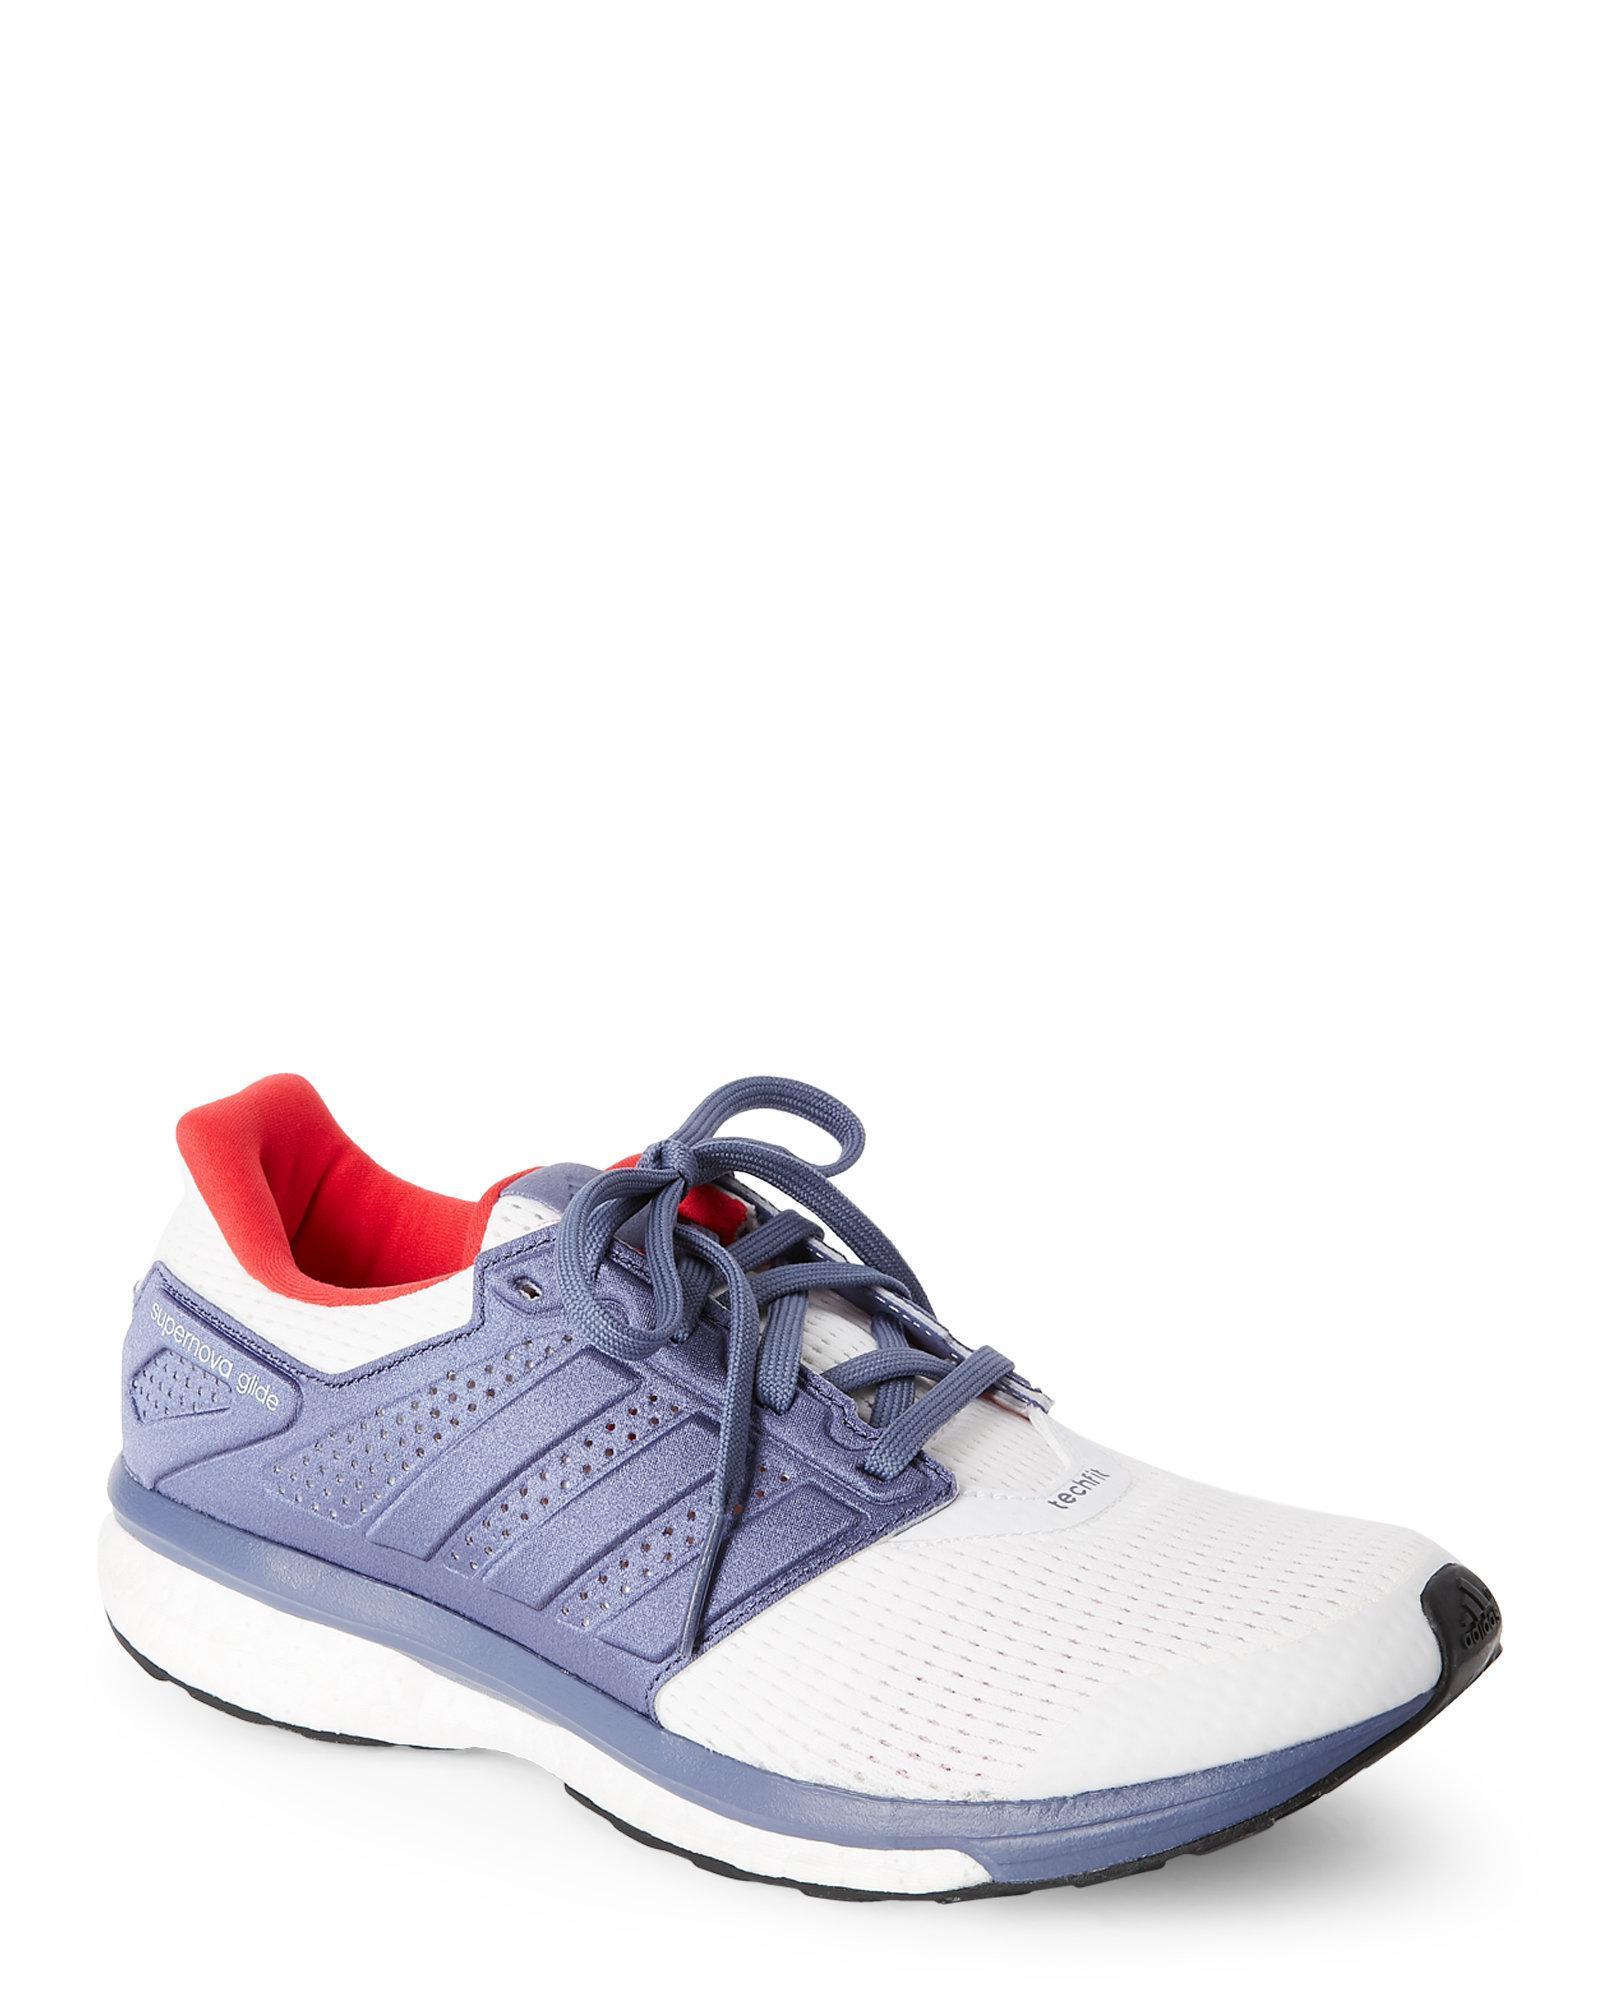 9d89786ca58b Reebok One Glide Women s Running Shoe Womens White